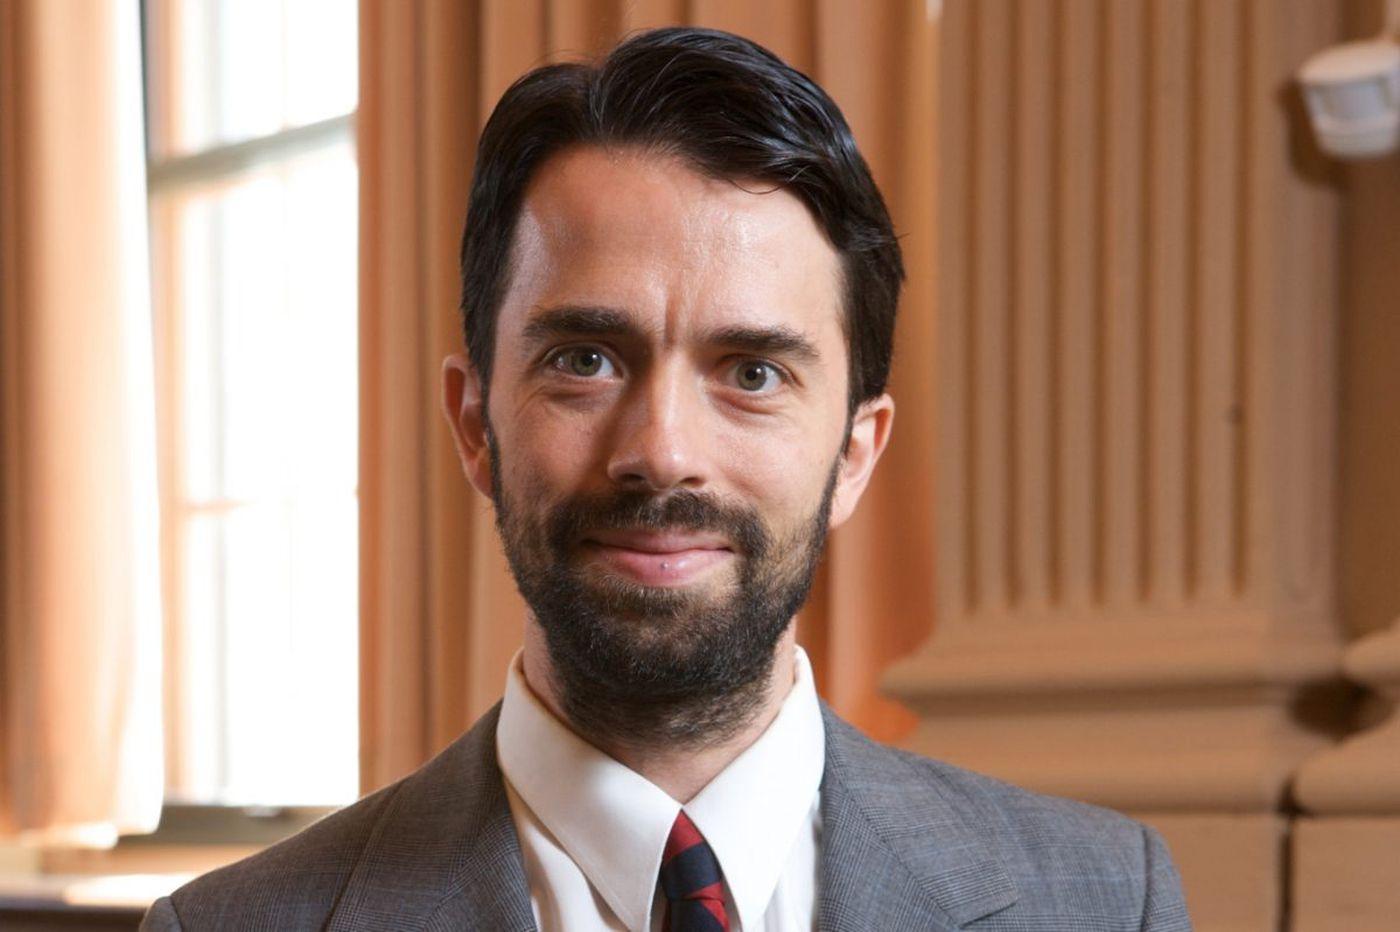 Senate confirms Penn professor for Third Circuit appeals court